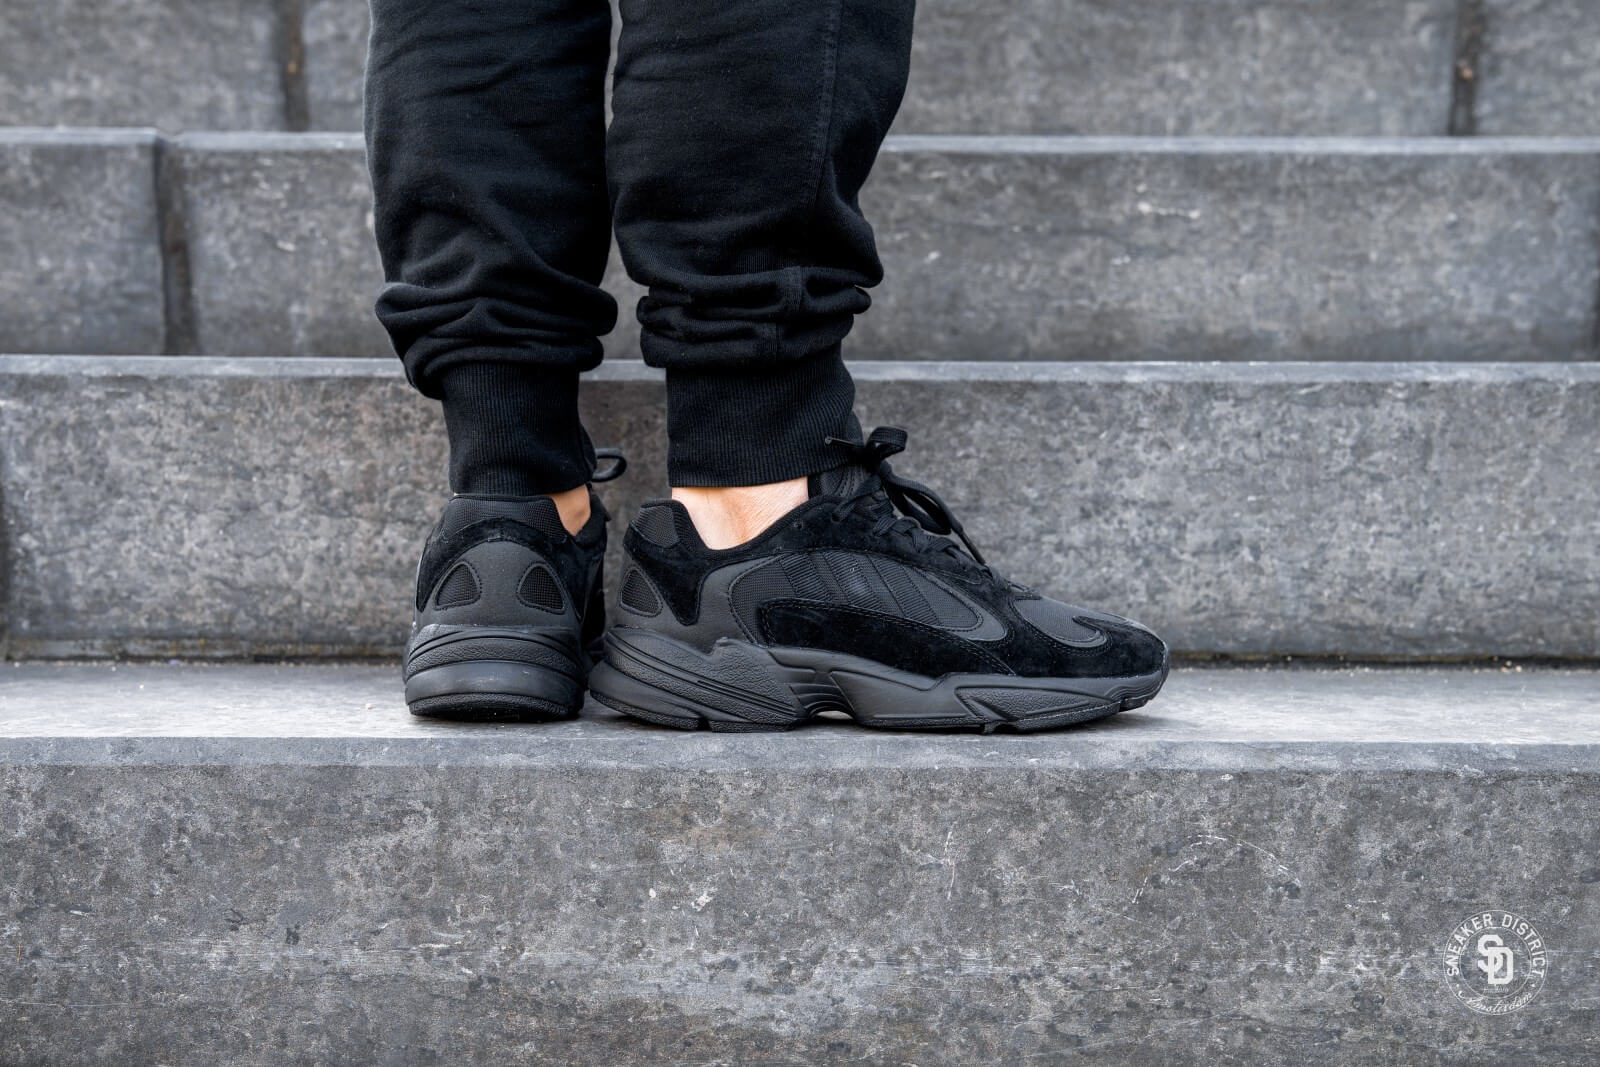 Adidas Yung-1 Core Black/Carbon - G27026